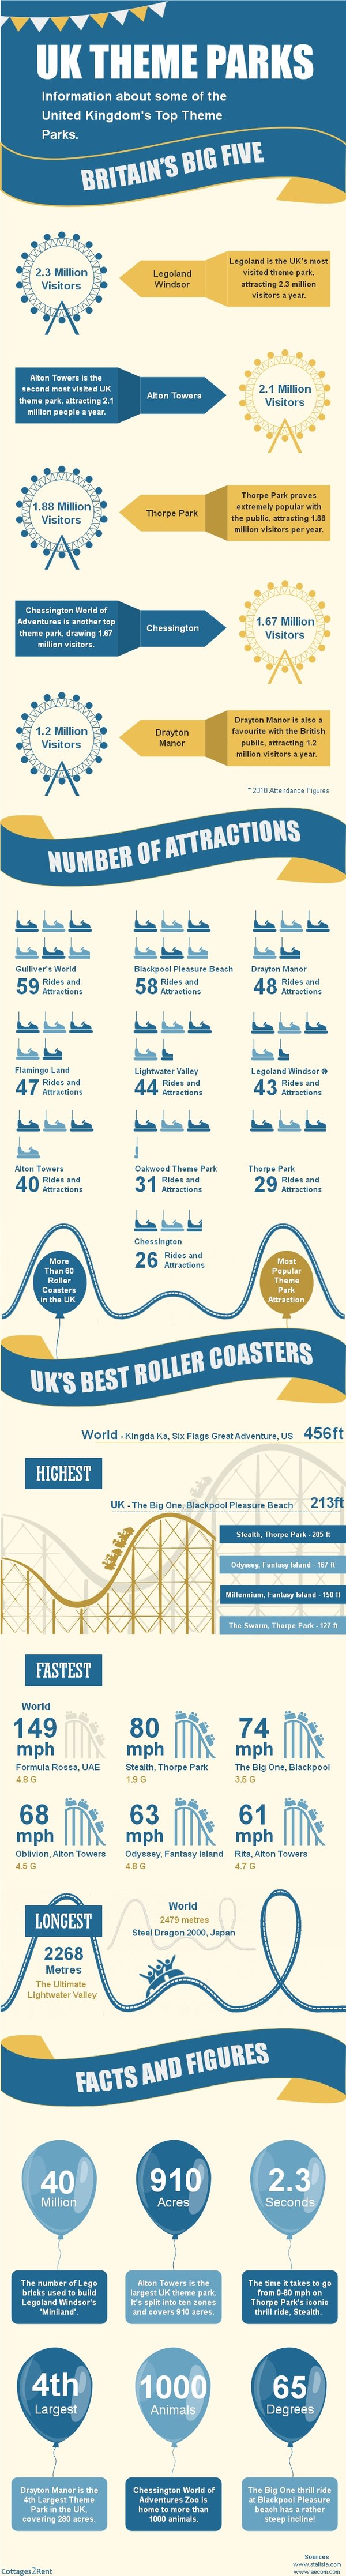 Top UK Theme Parks